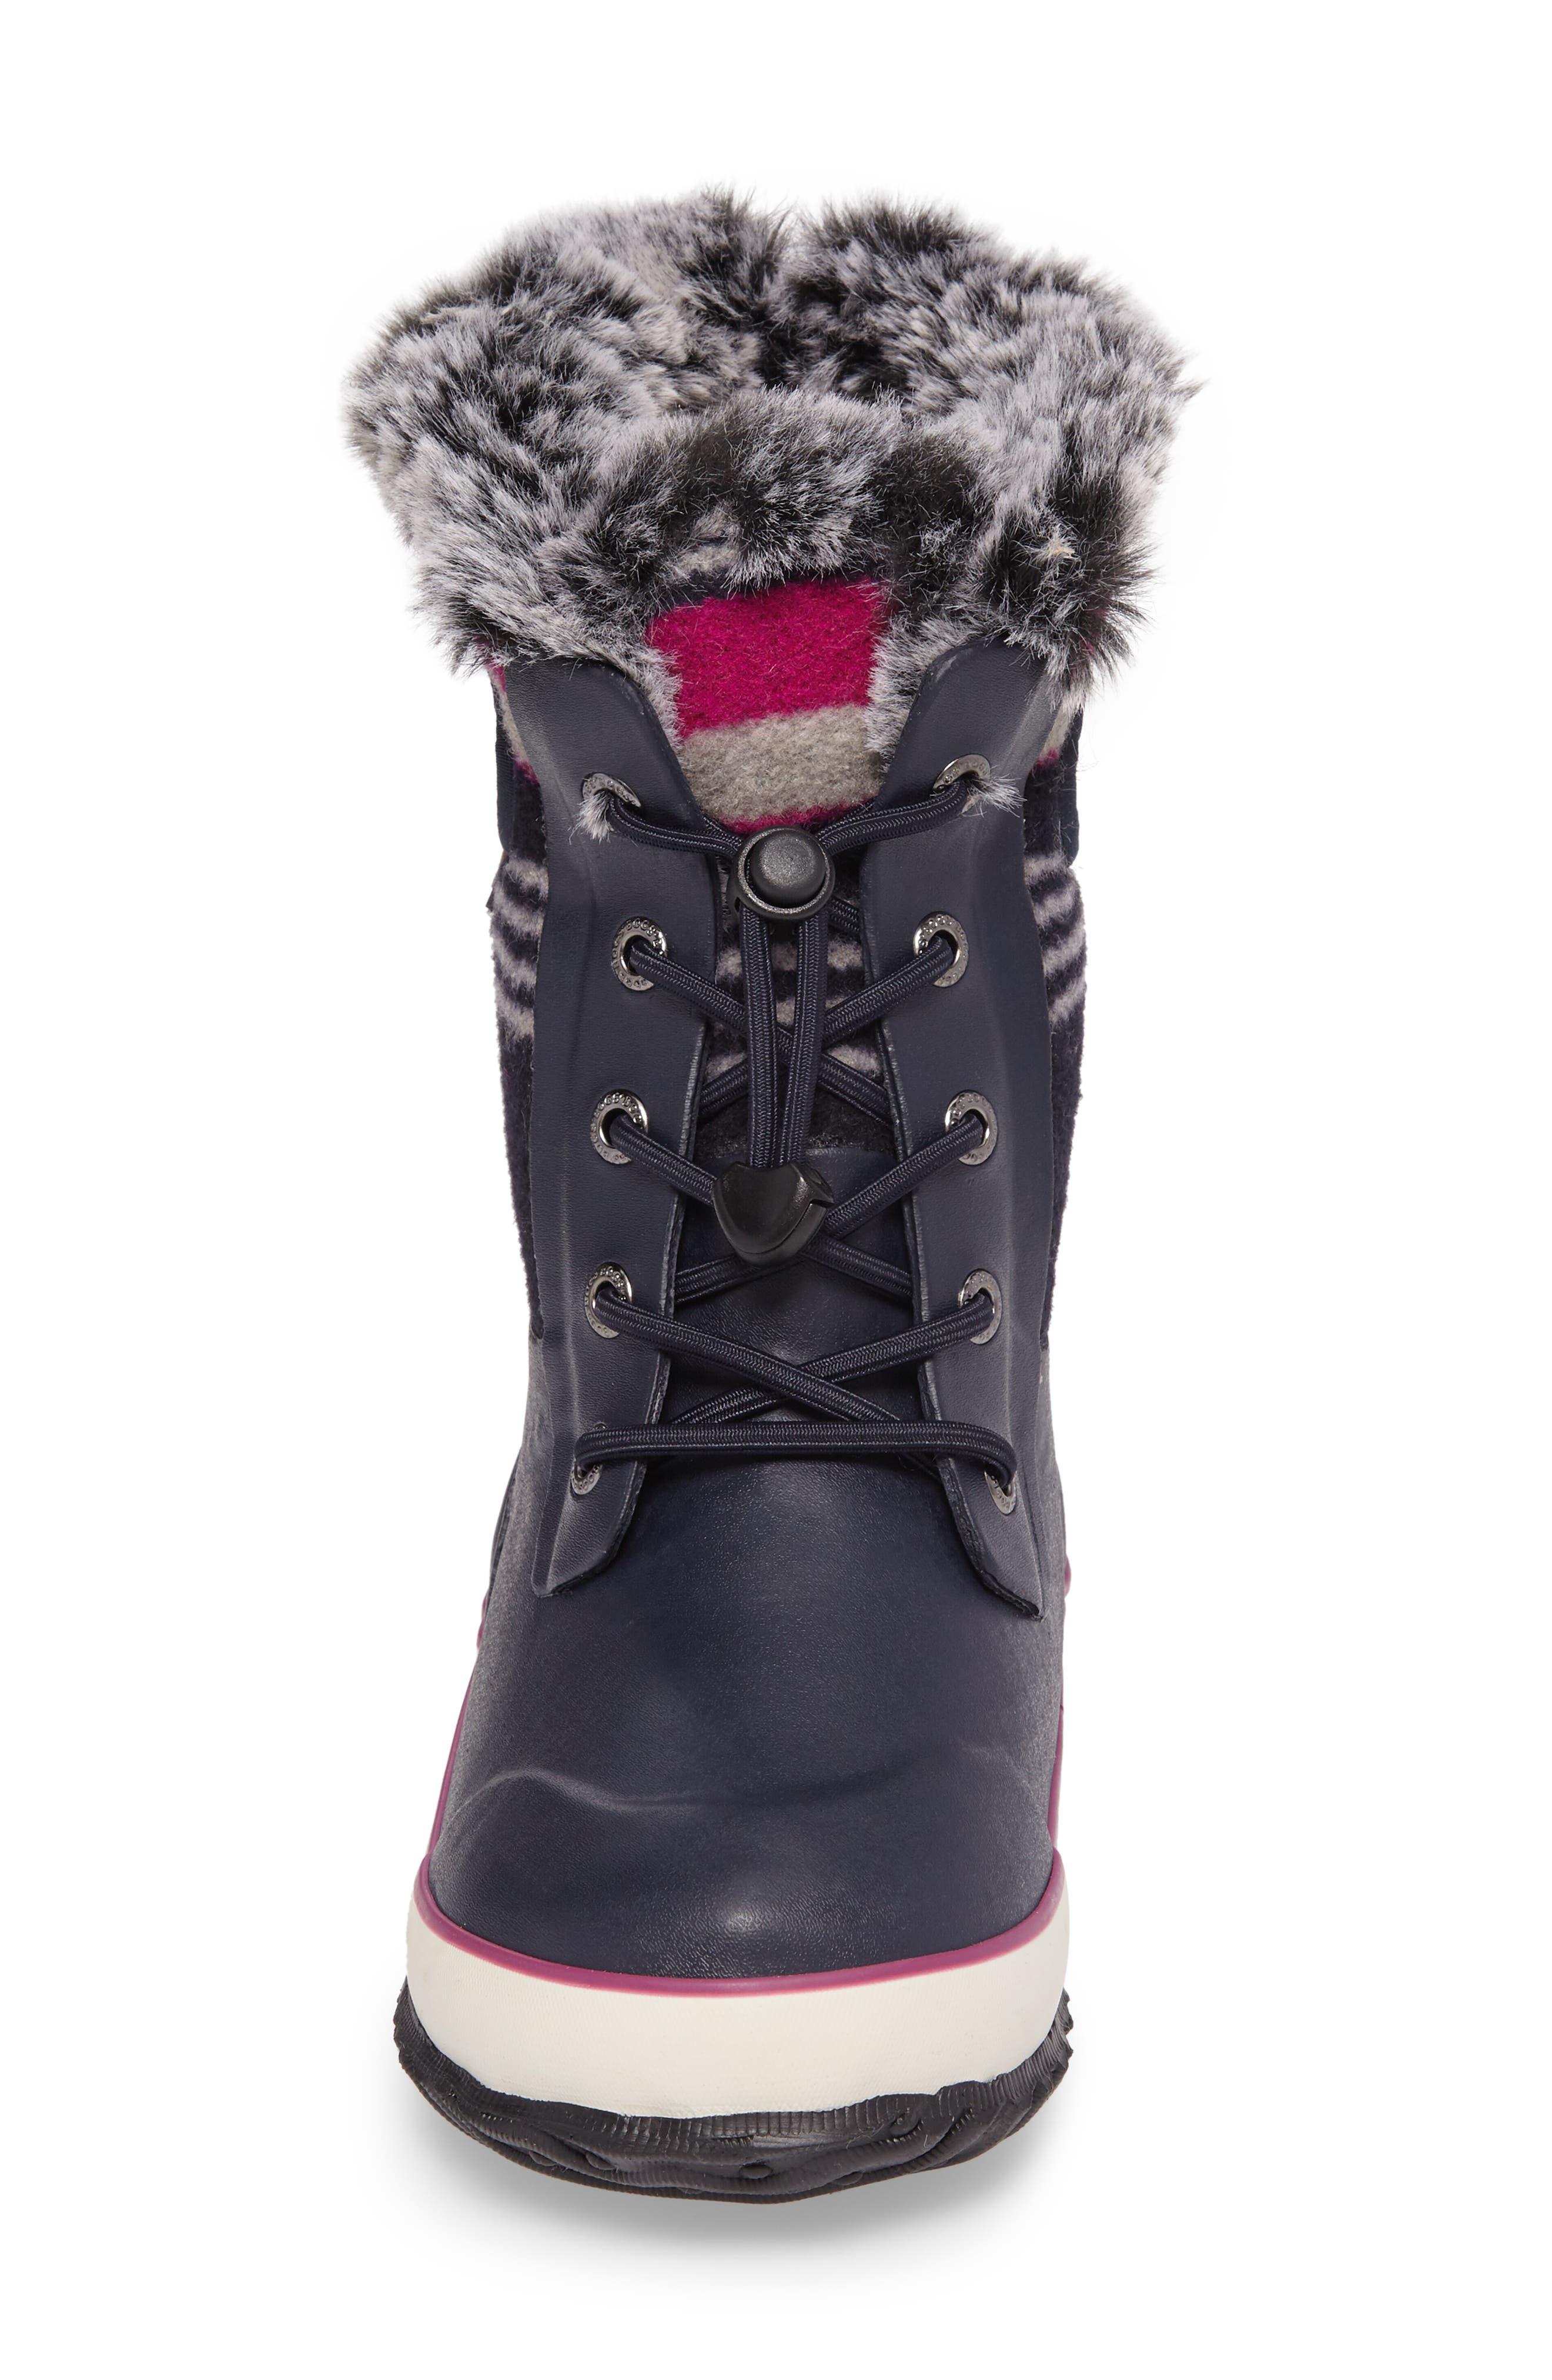 Alternate Image 4  - Bogs Arcata Stripe Waterproof Insulated Faux Fur Boot (Walker, Toddler, Little Kid & Big Kid)